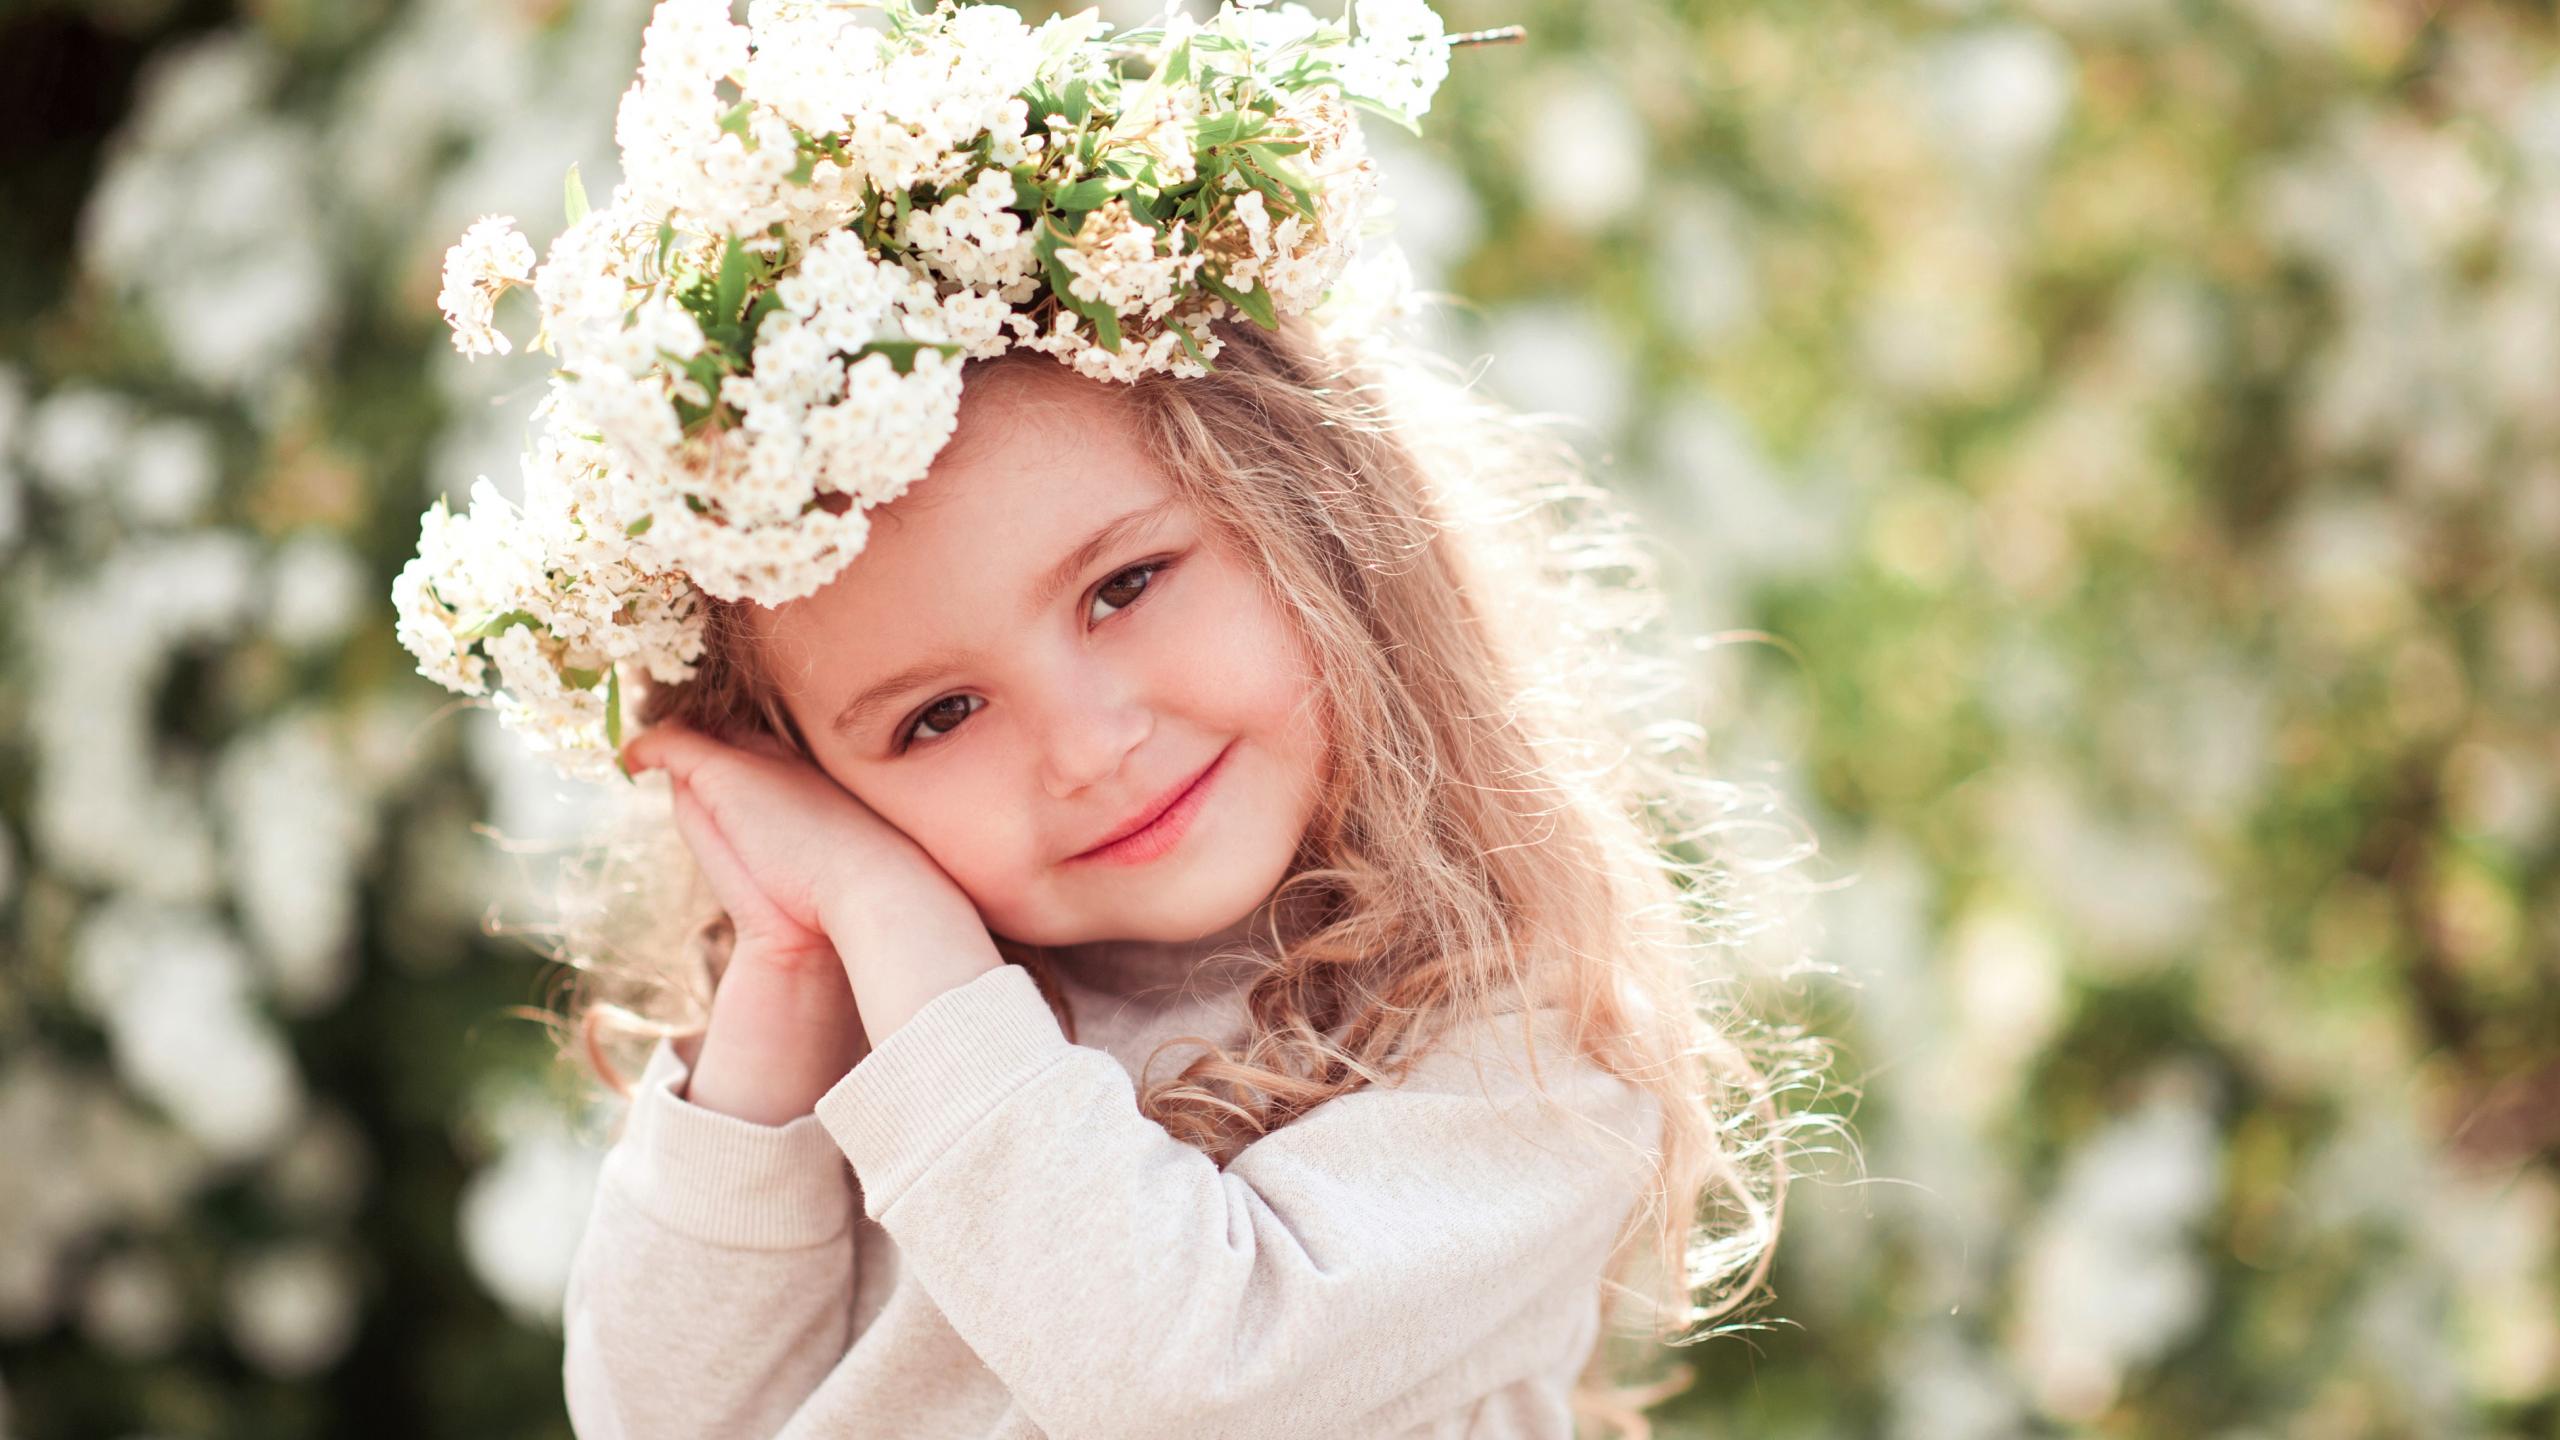 Download 2560x1440 Wallpaper Cute Kid Child Flower Crown Dual